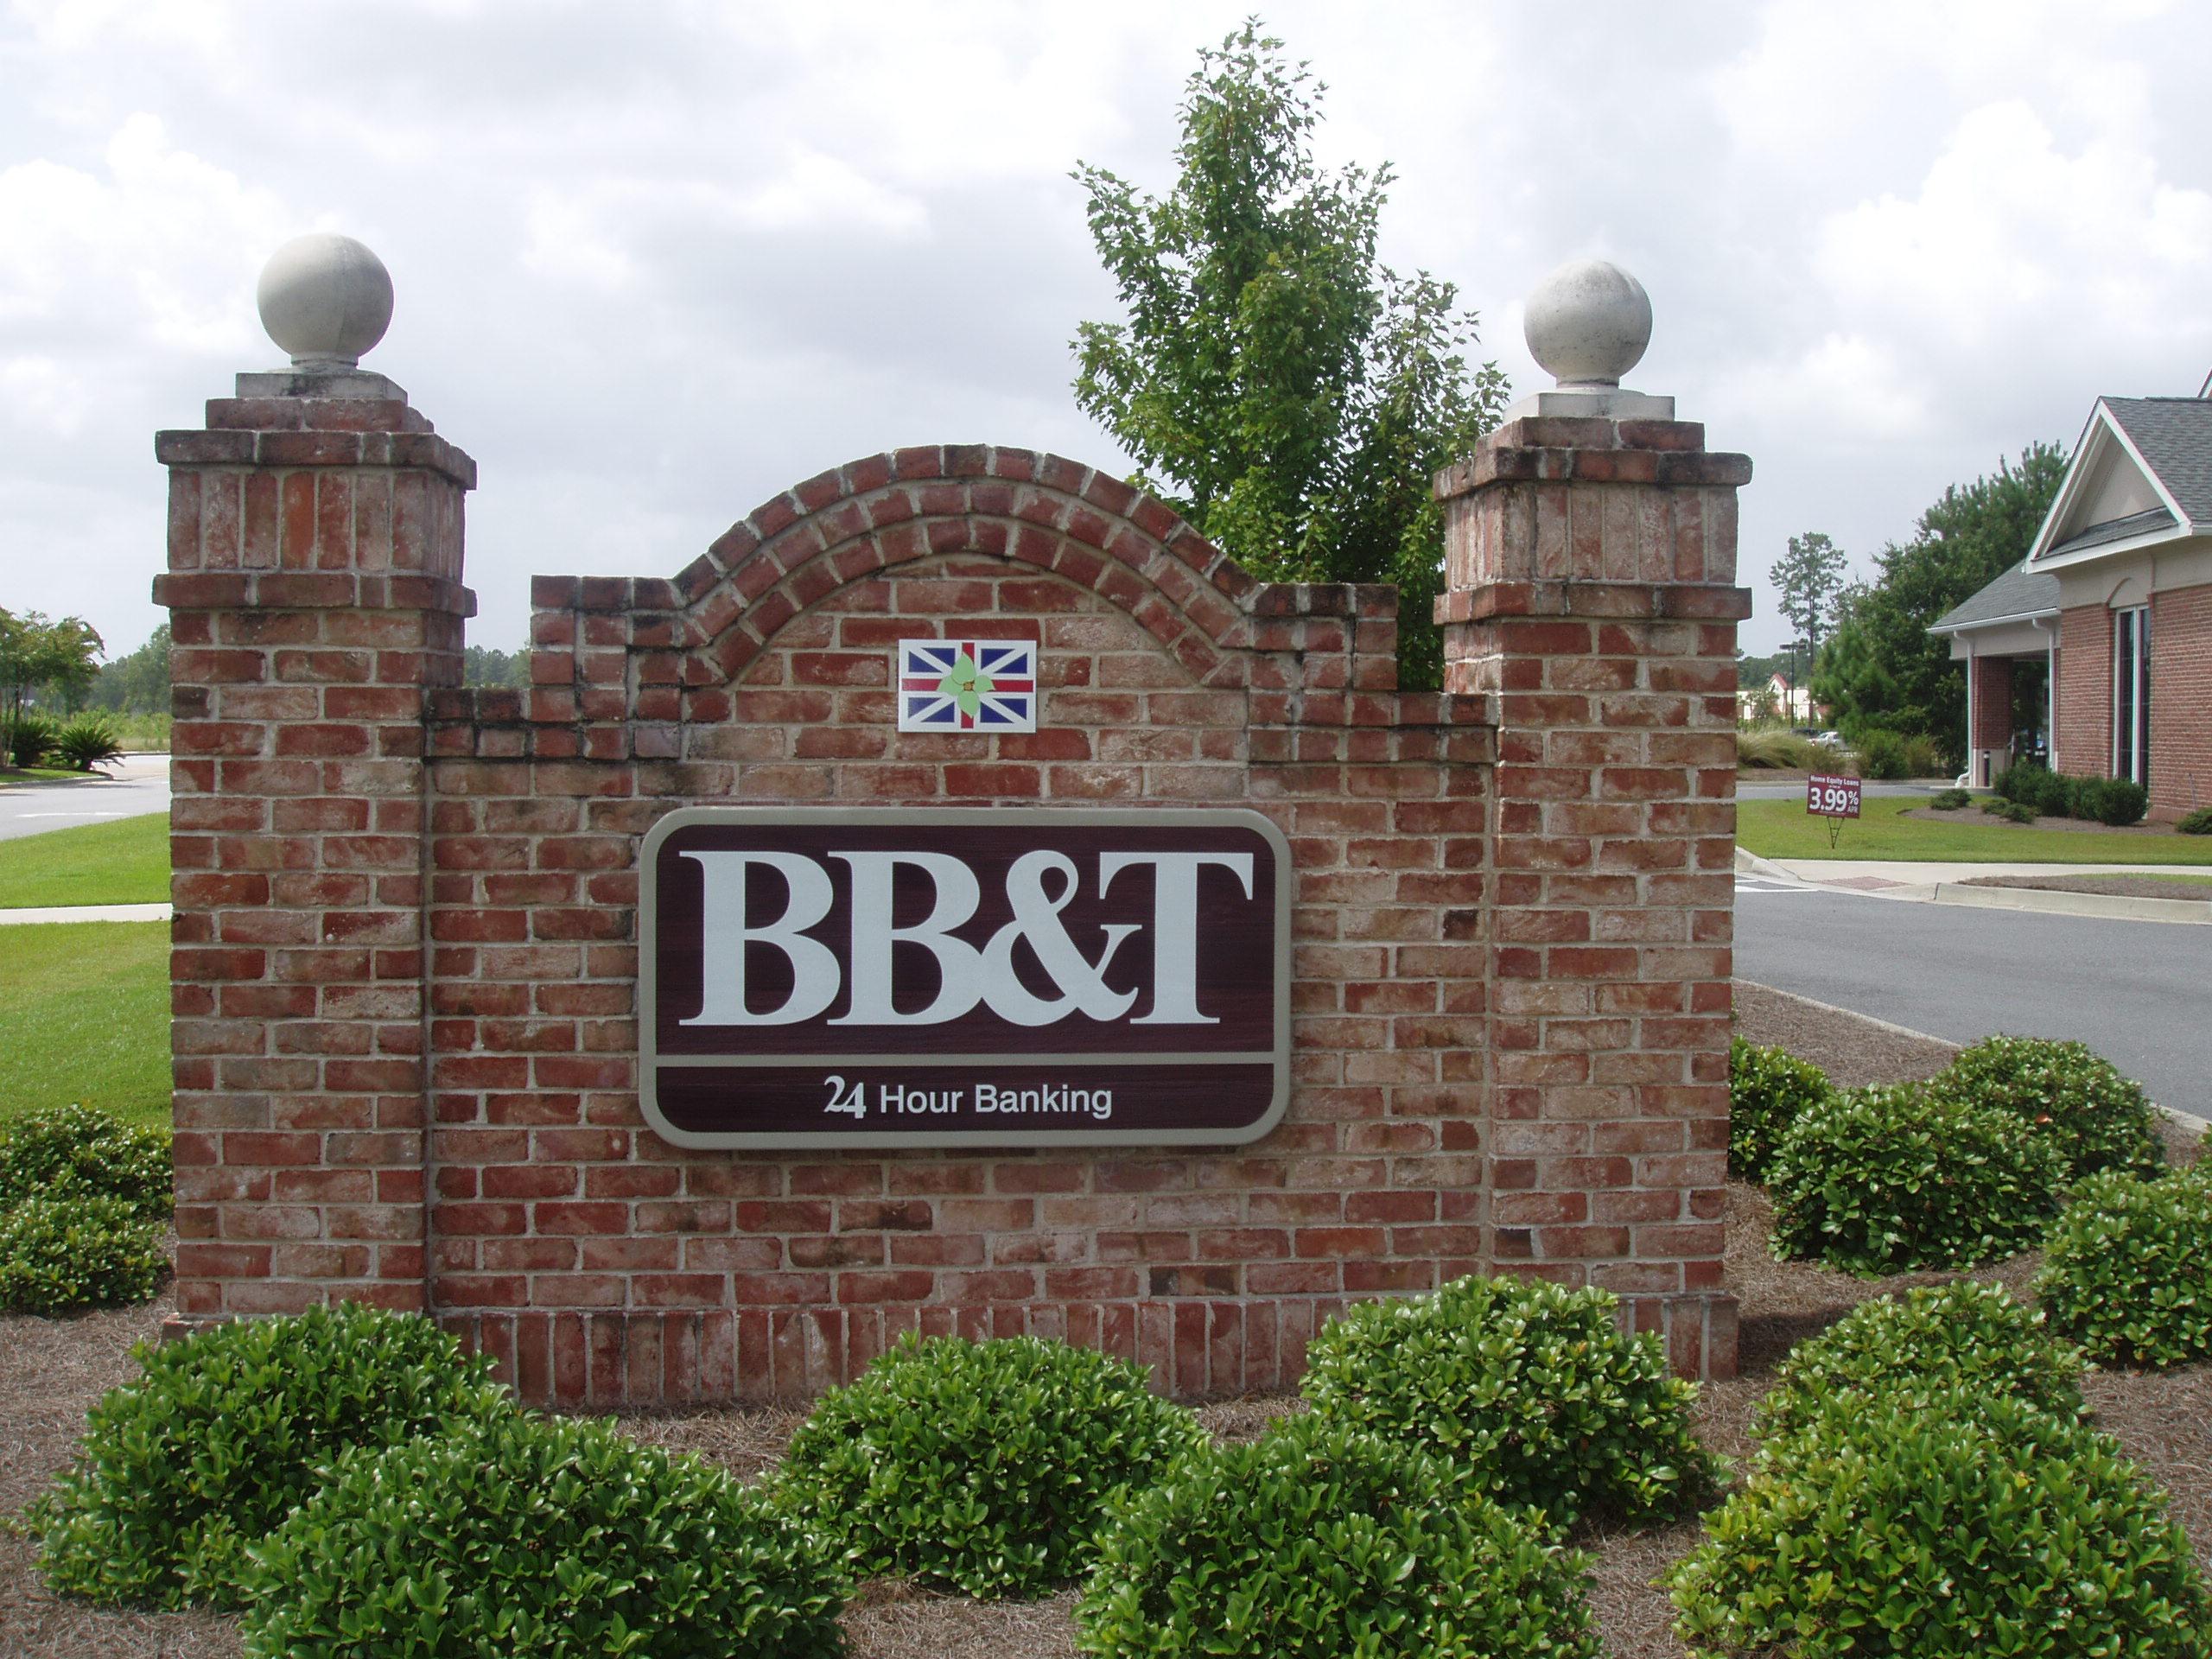 BB&T Bank Signage